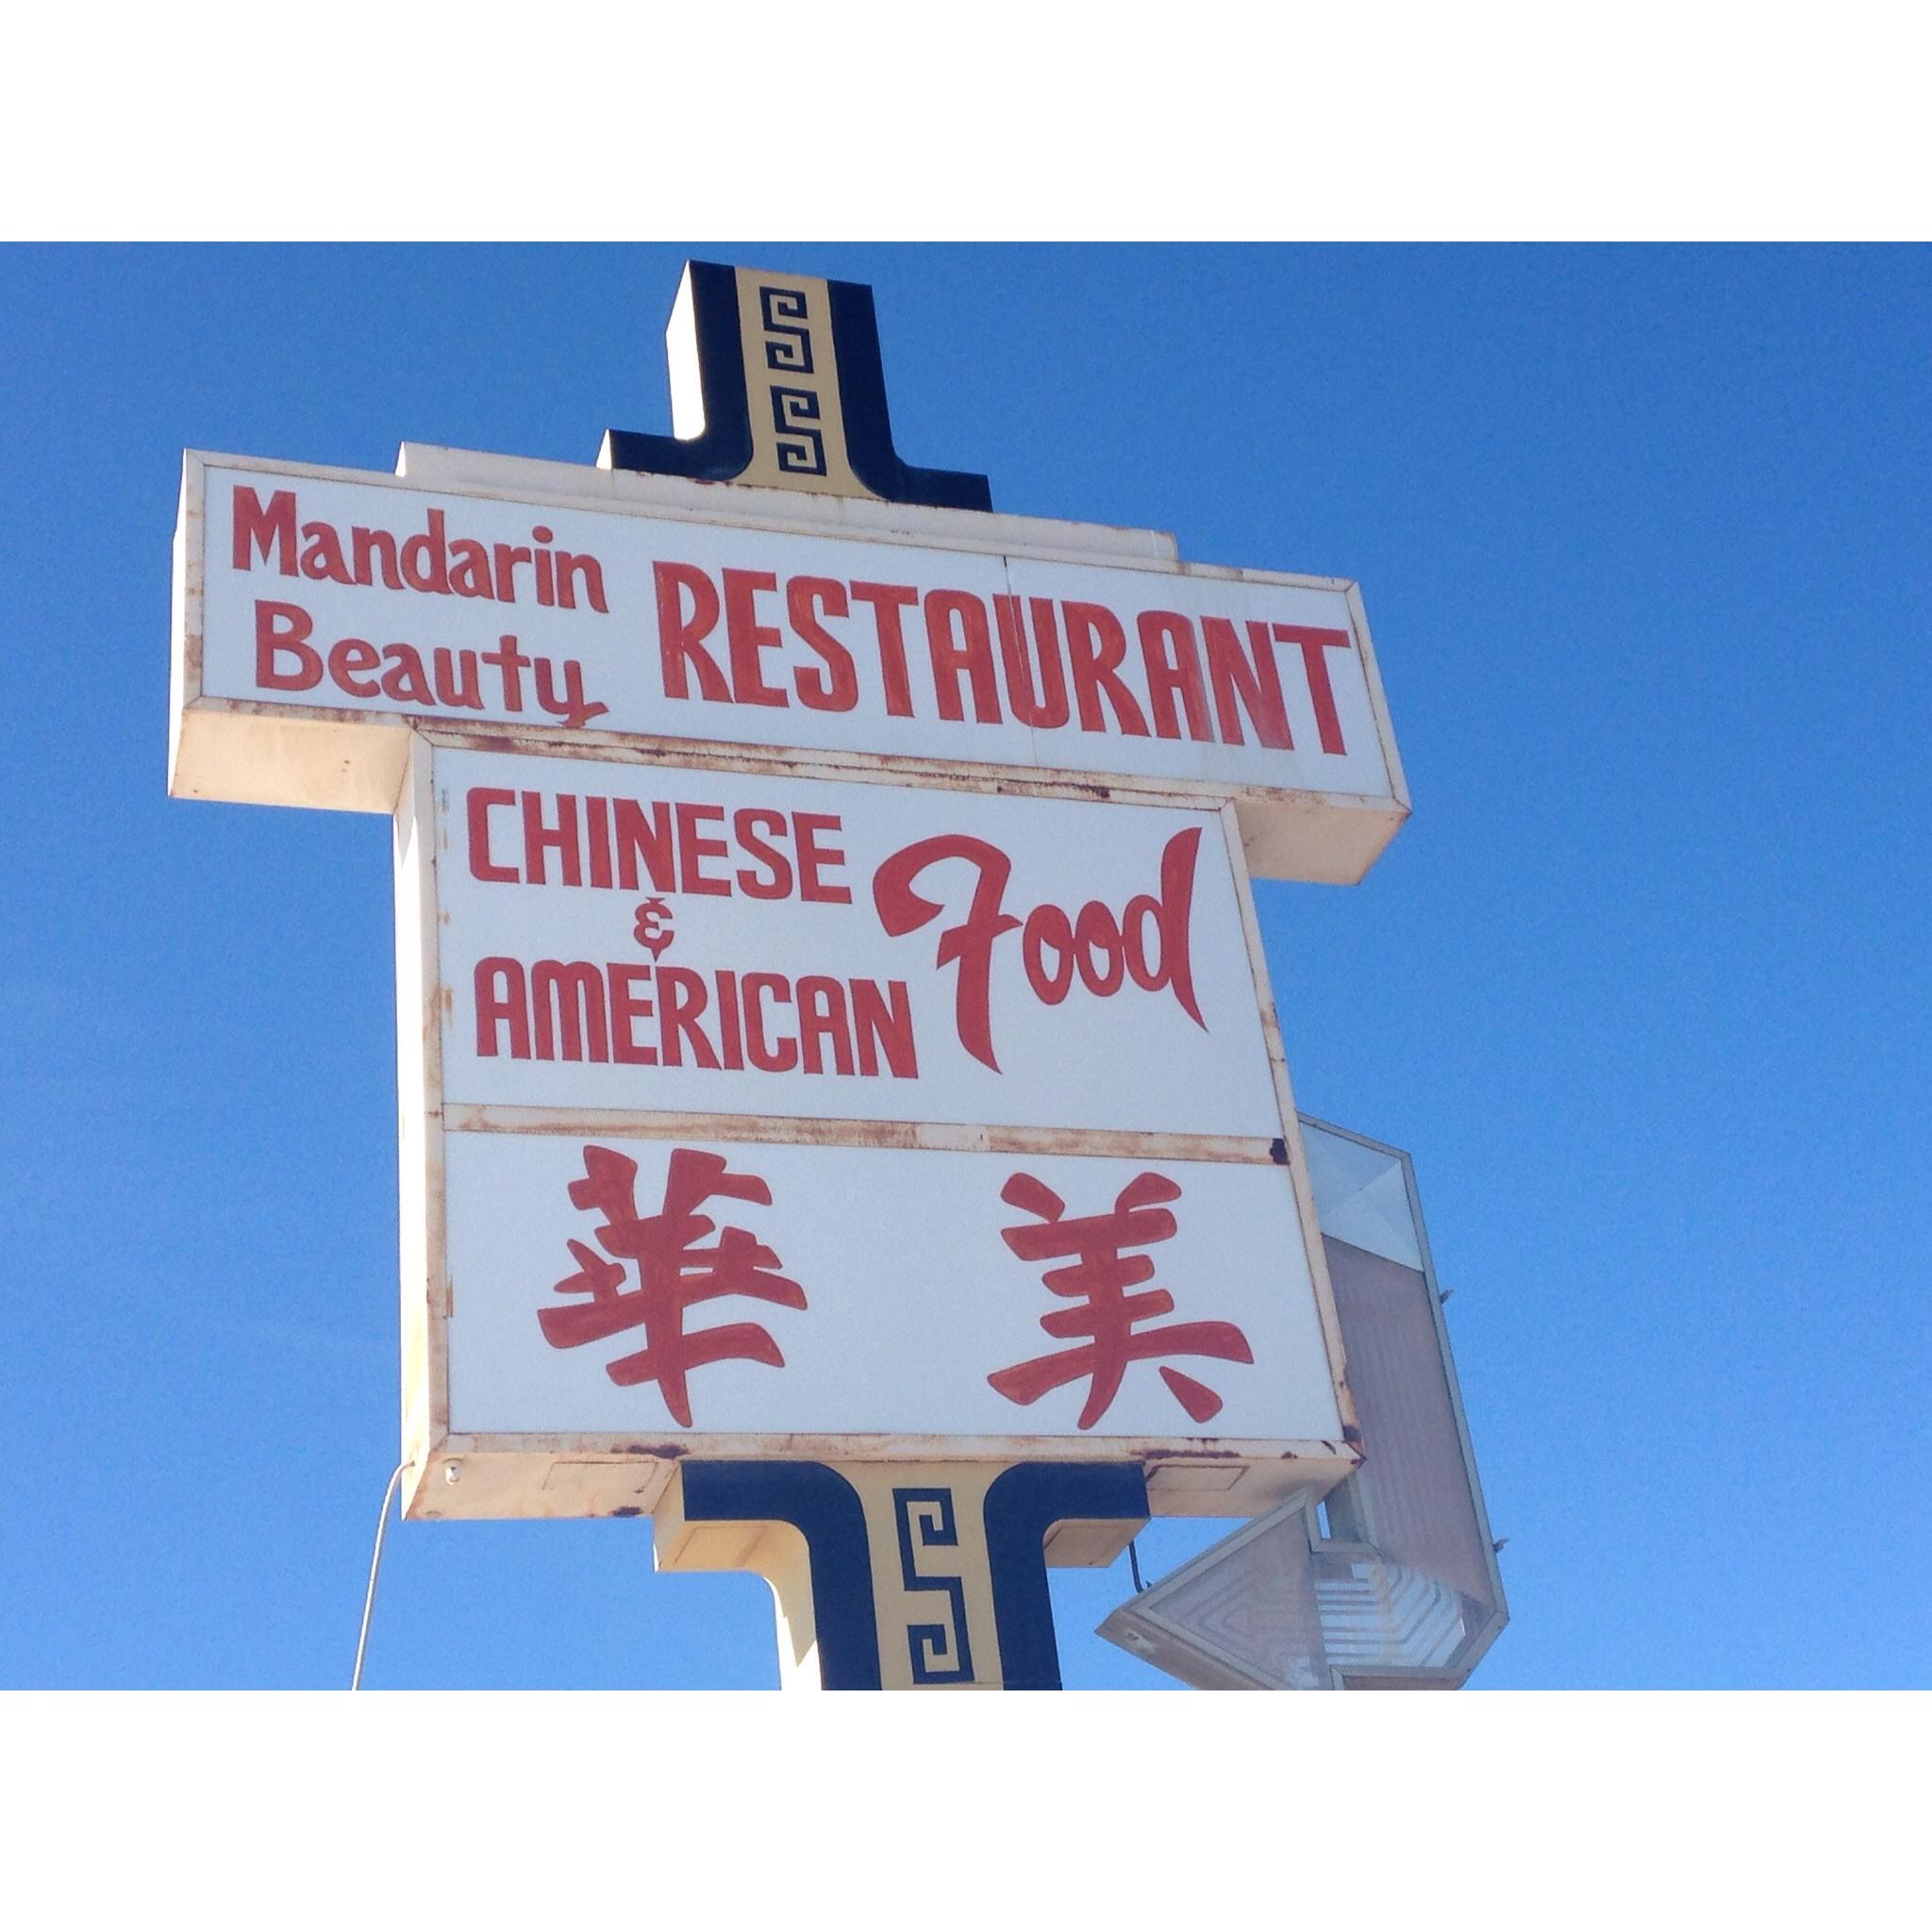 Mandarin Beauty Restaurant